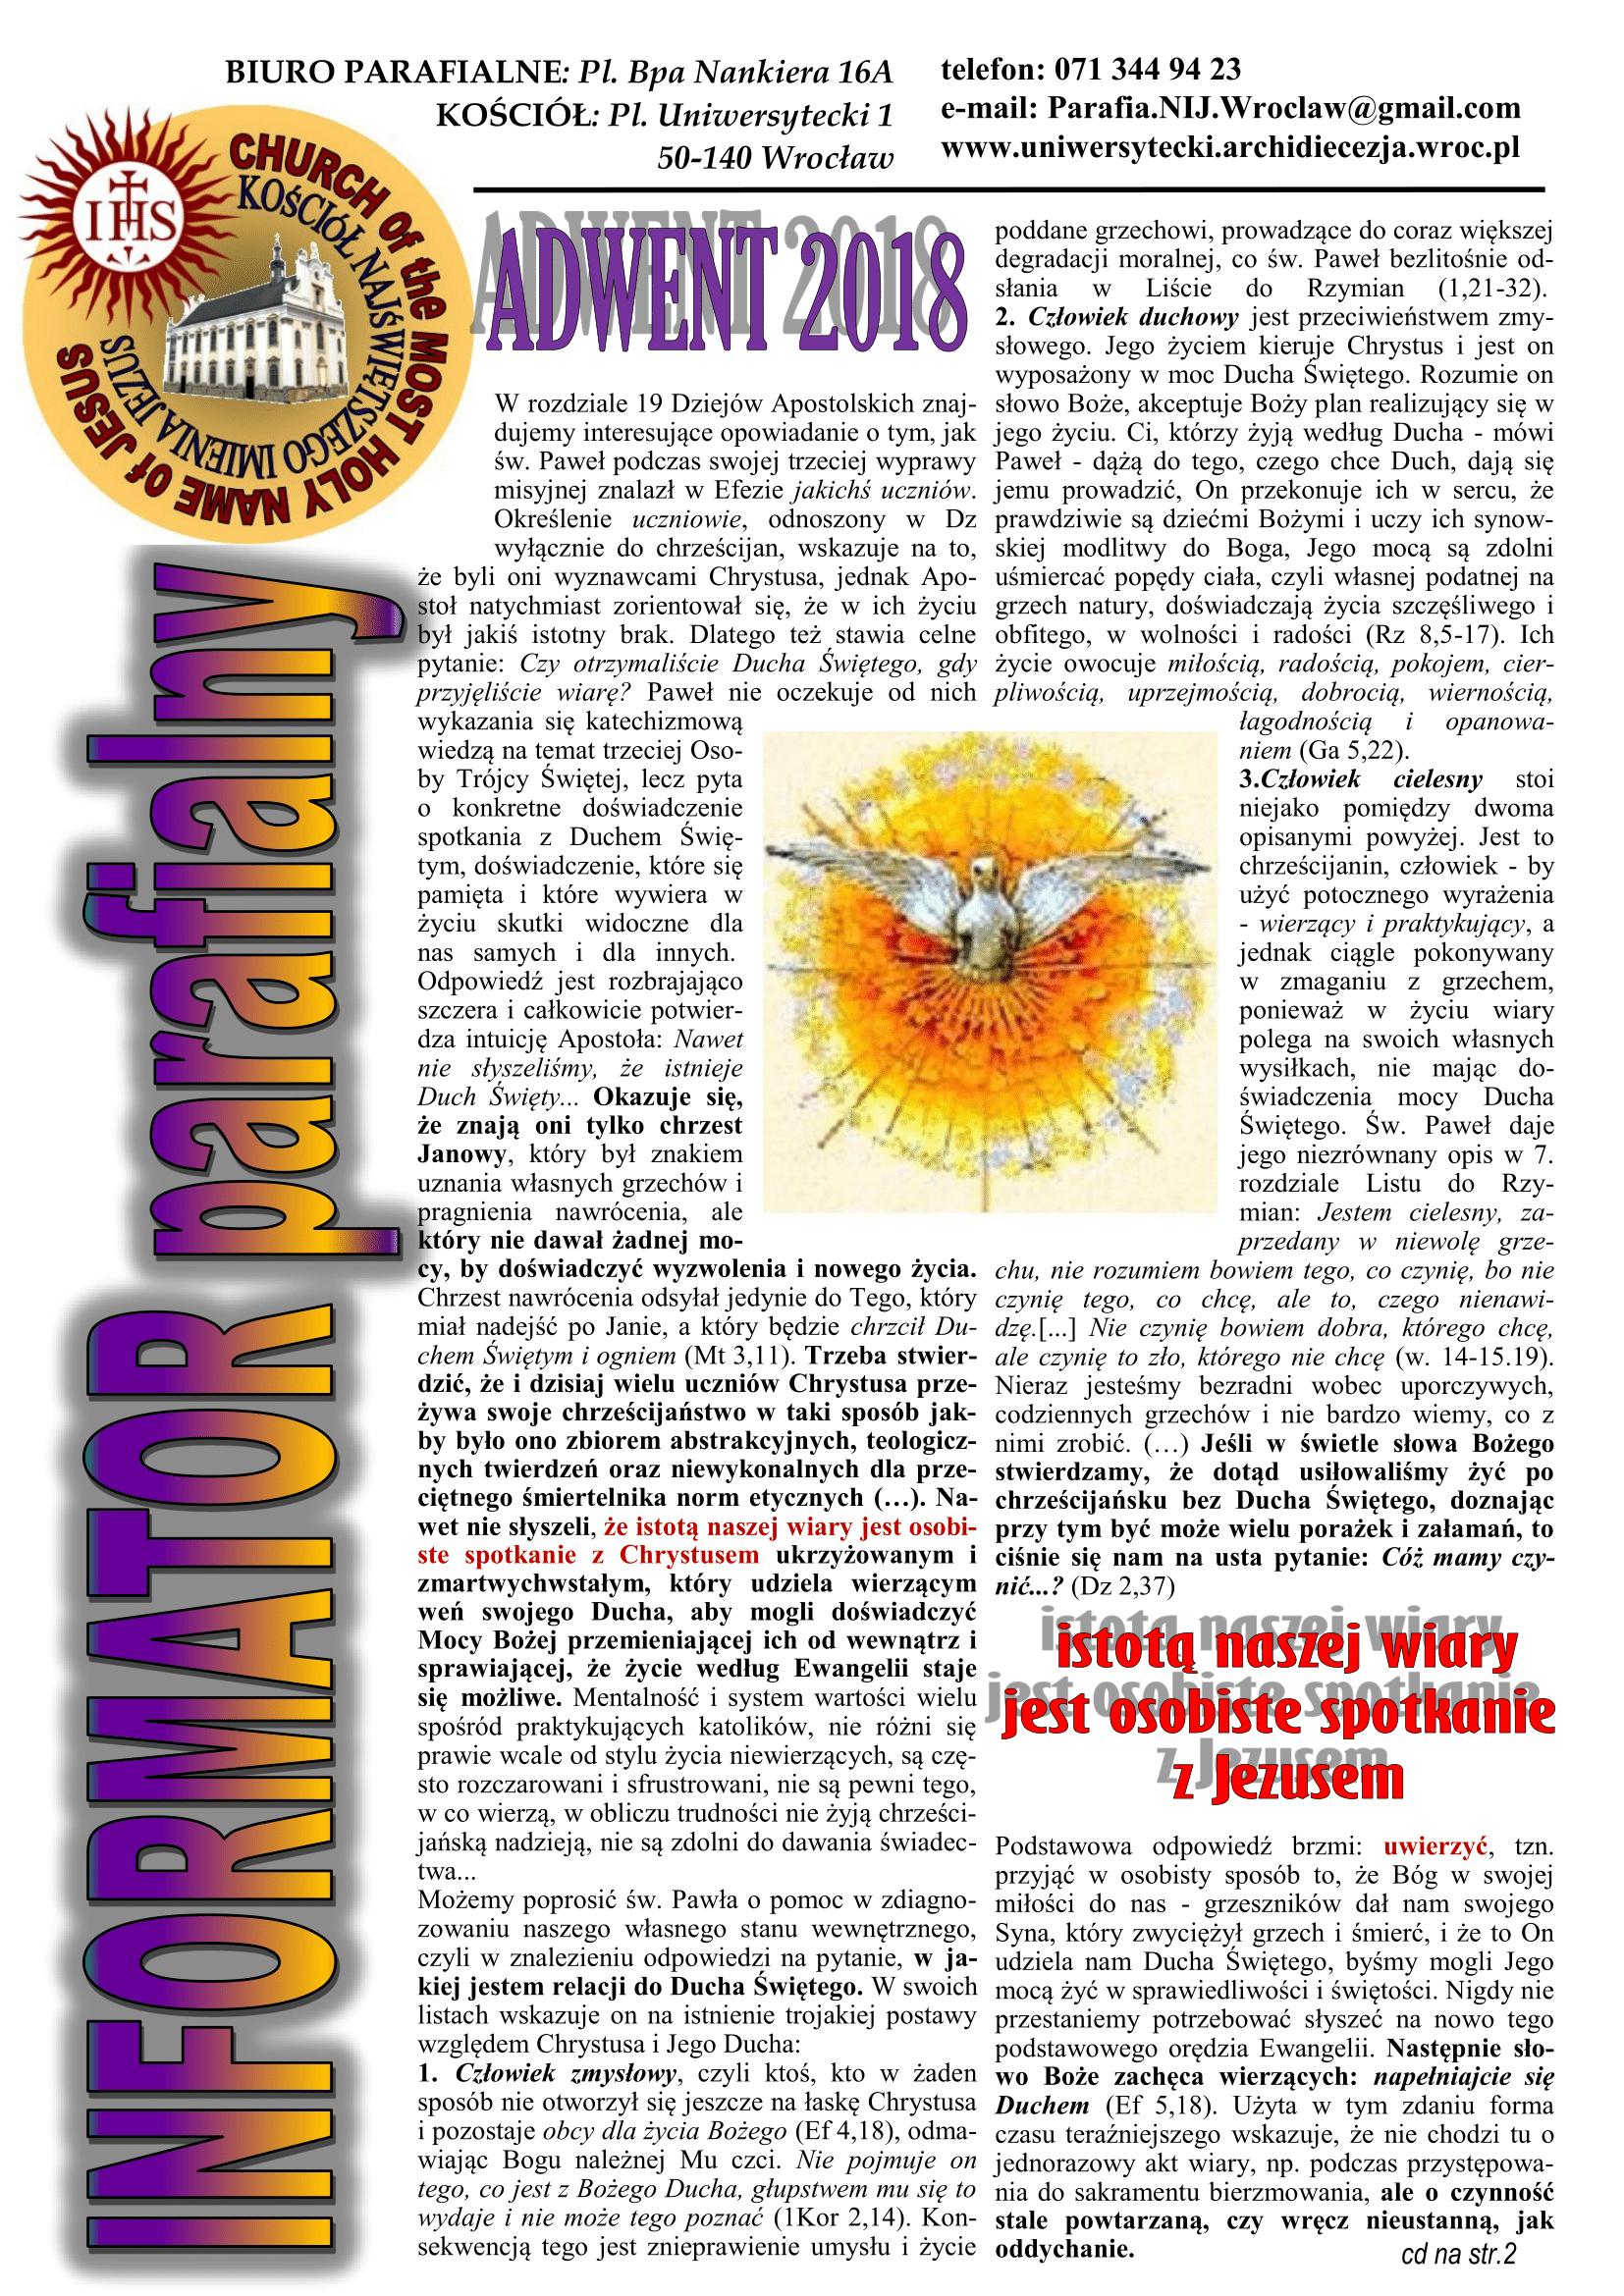 BIULETYN 19 Adwent 2018